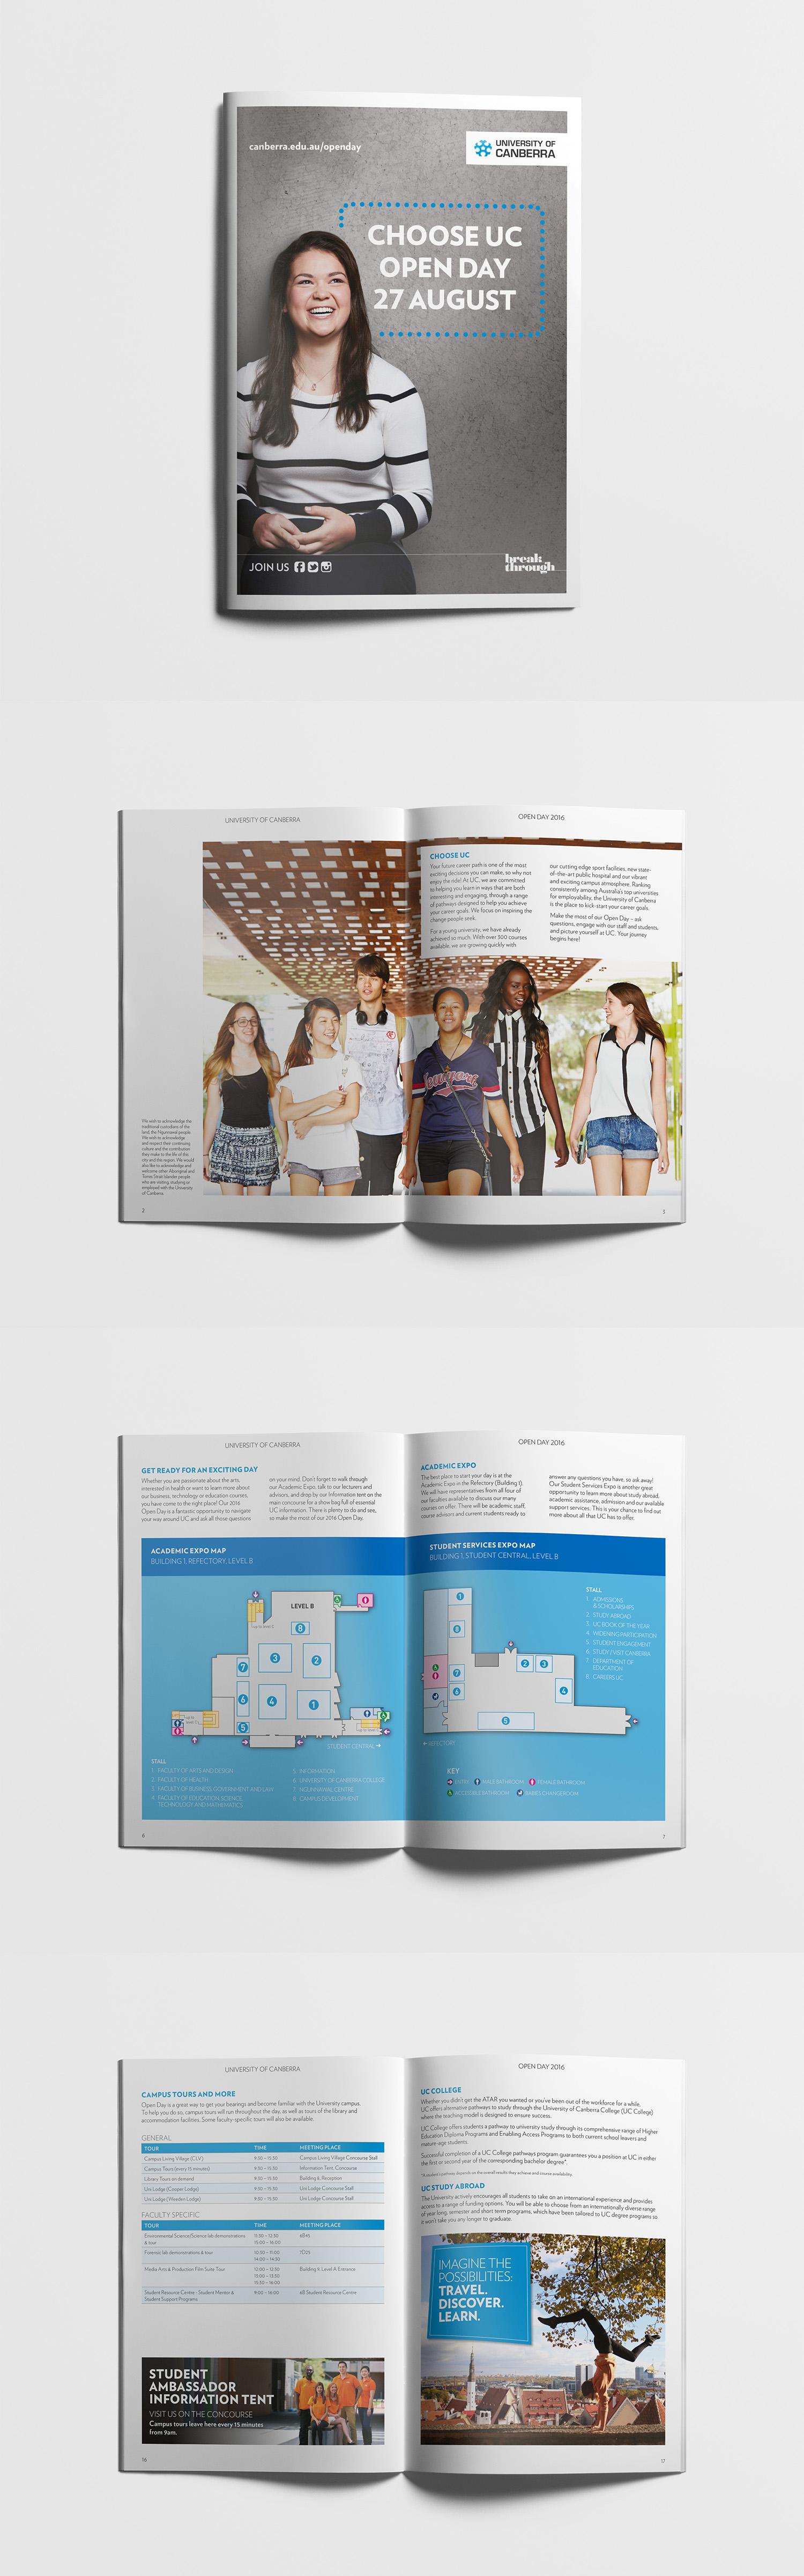 UC-04-brochure-cover+spreads-1500.jpg